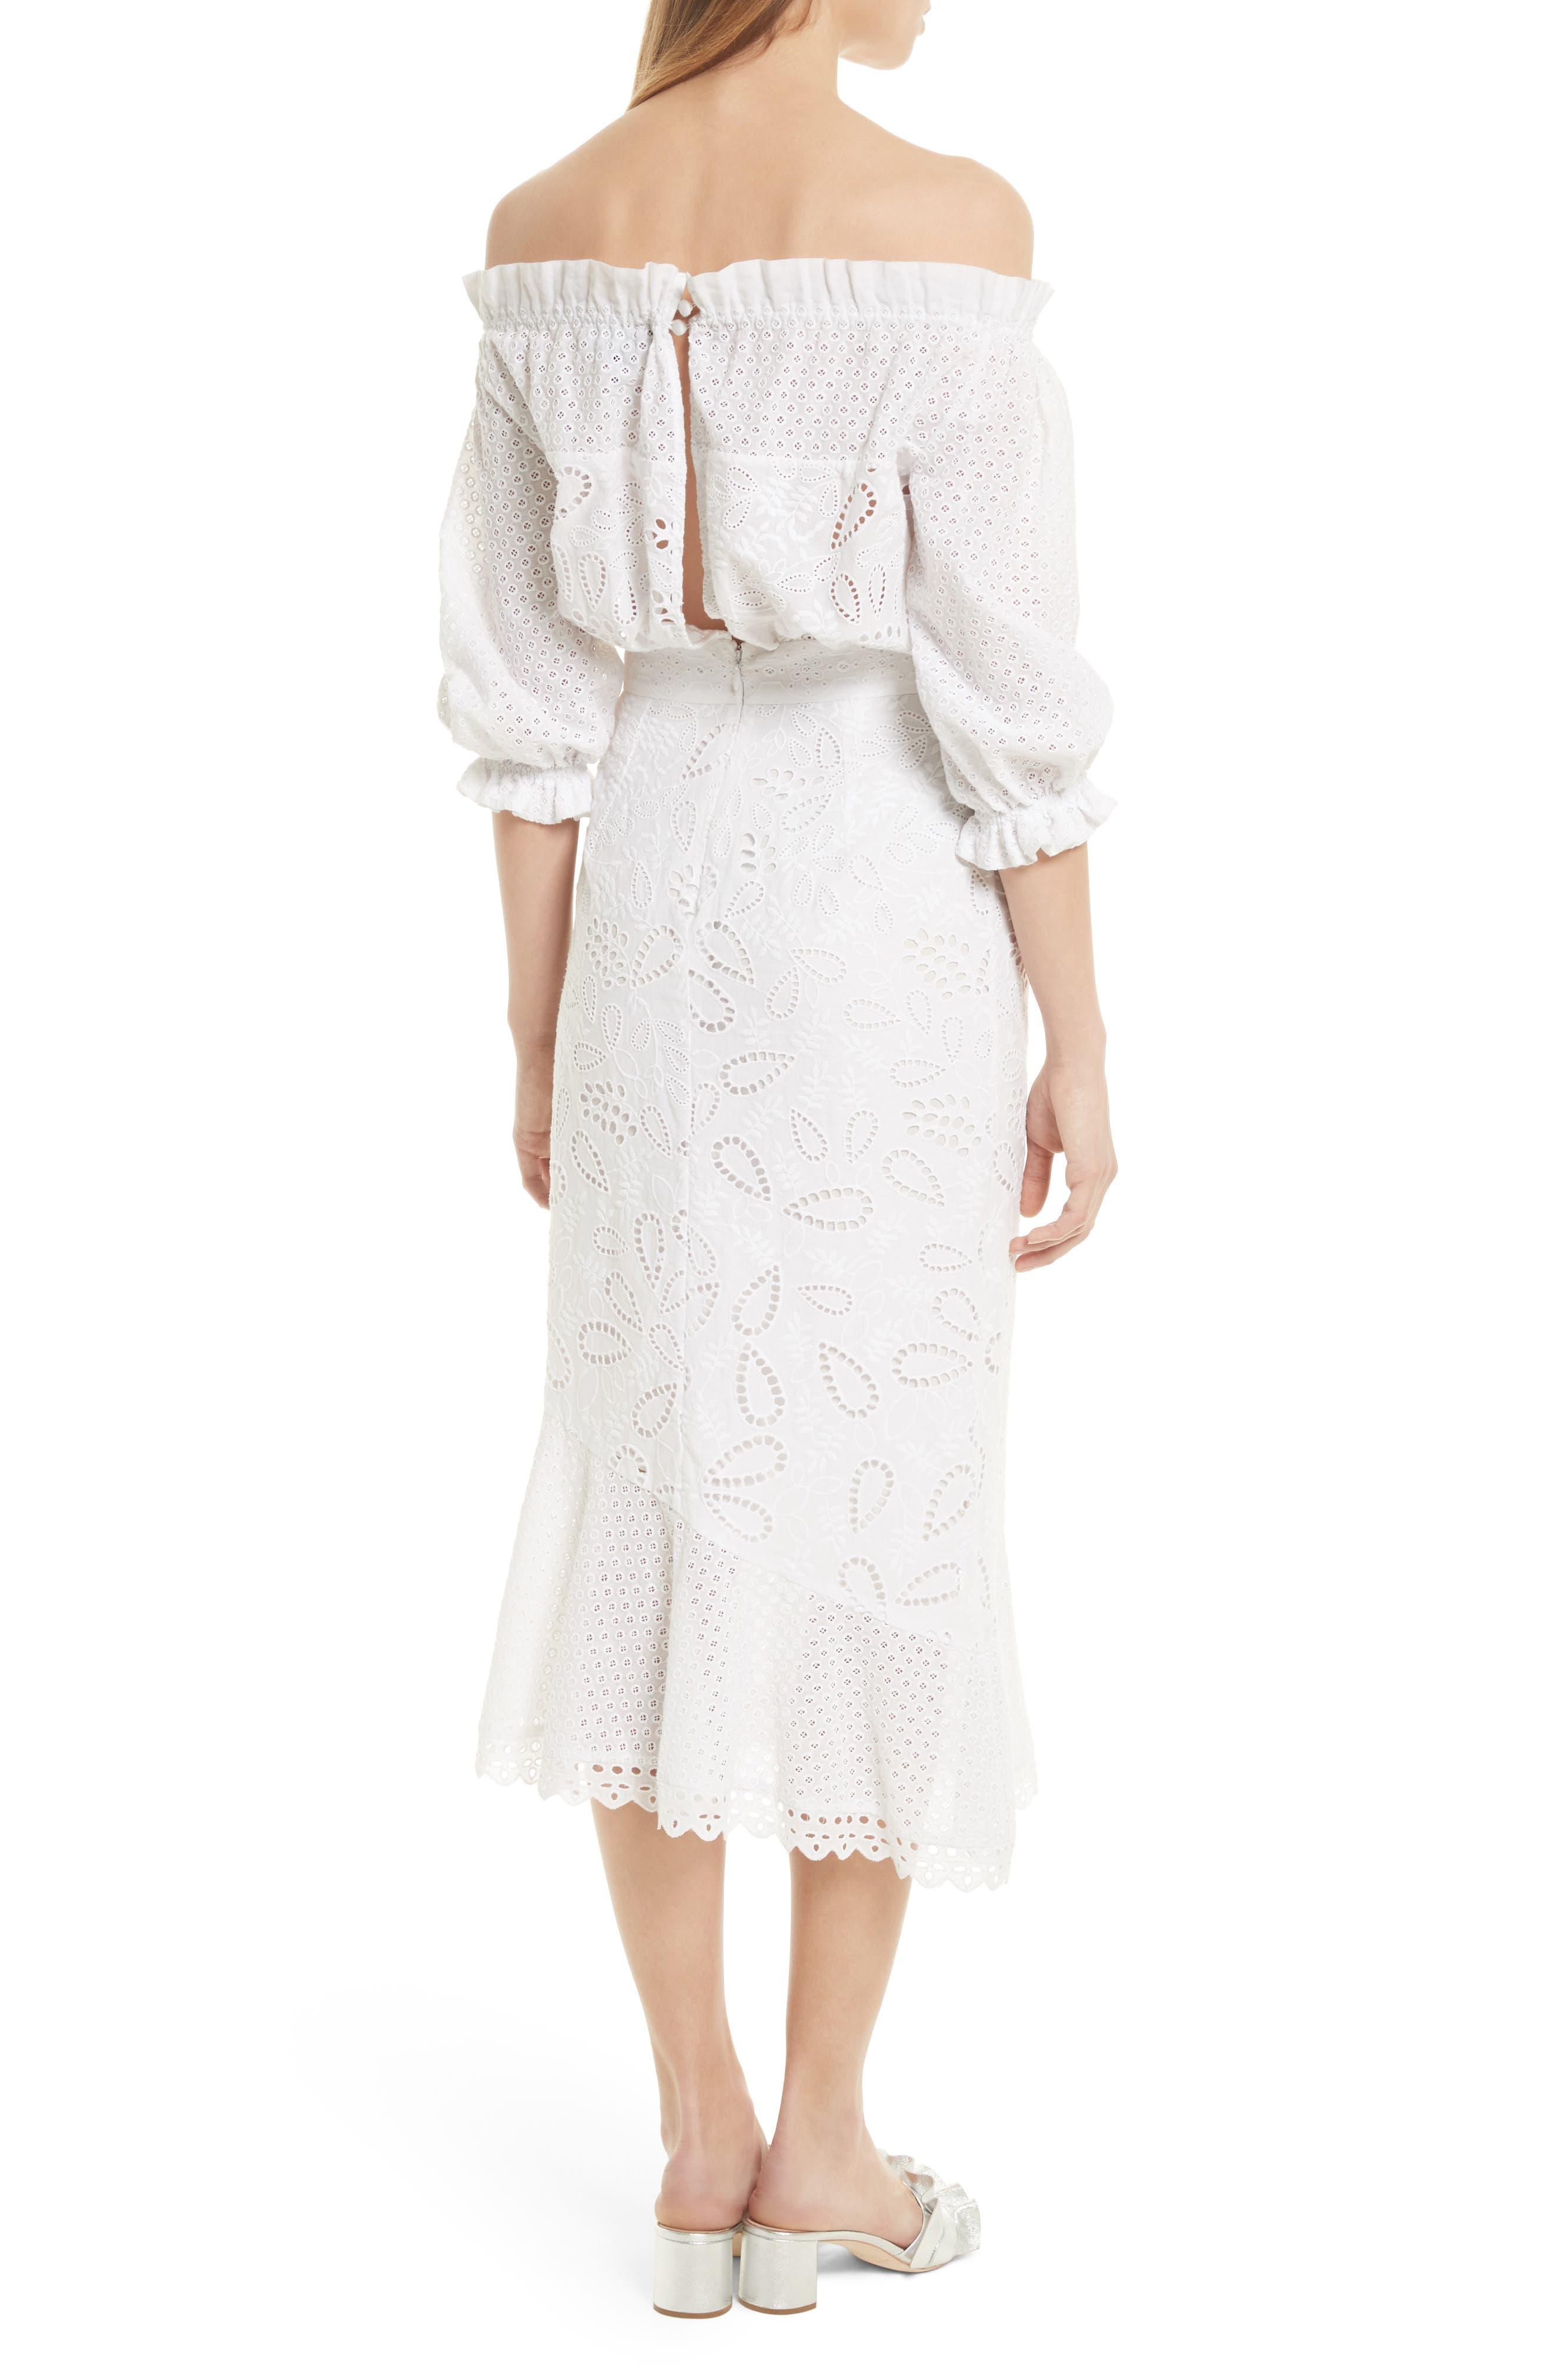 Grace Cotton Off the Shoulder Dress,                             Alternate thumbnail 2, color,                             White/ French Lace